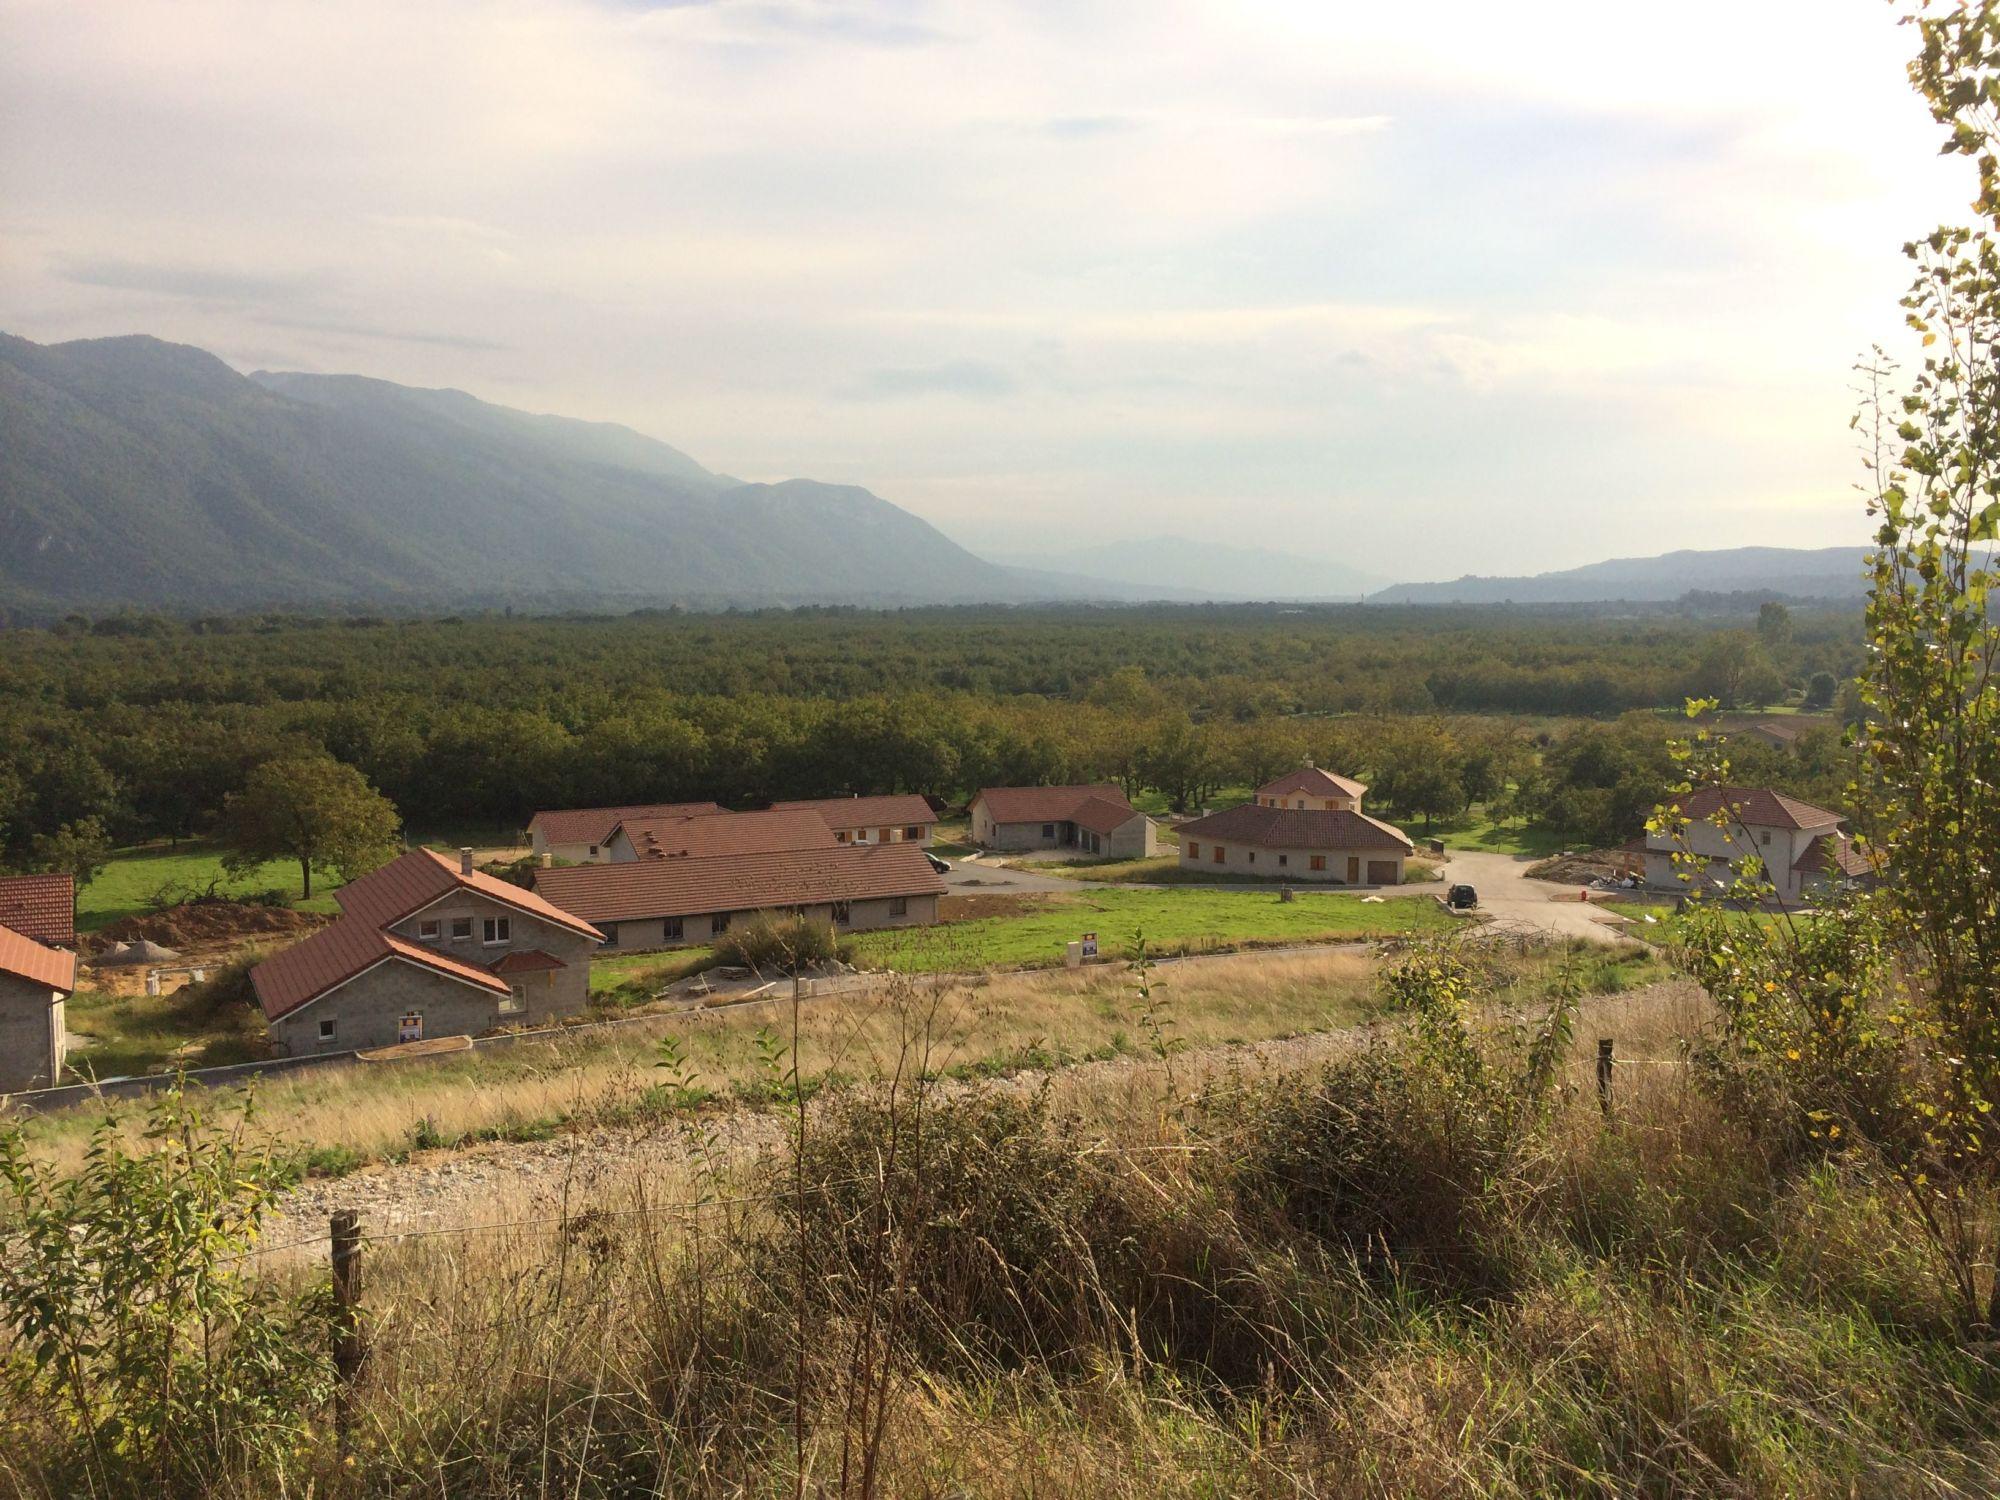 Aménagement de 23 lots Les Terrasses du Vercors en Isère